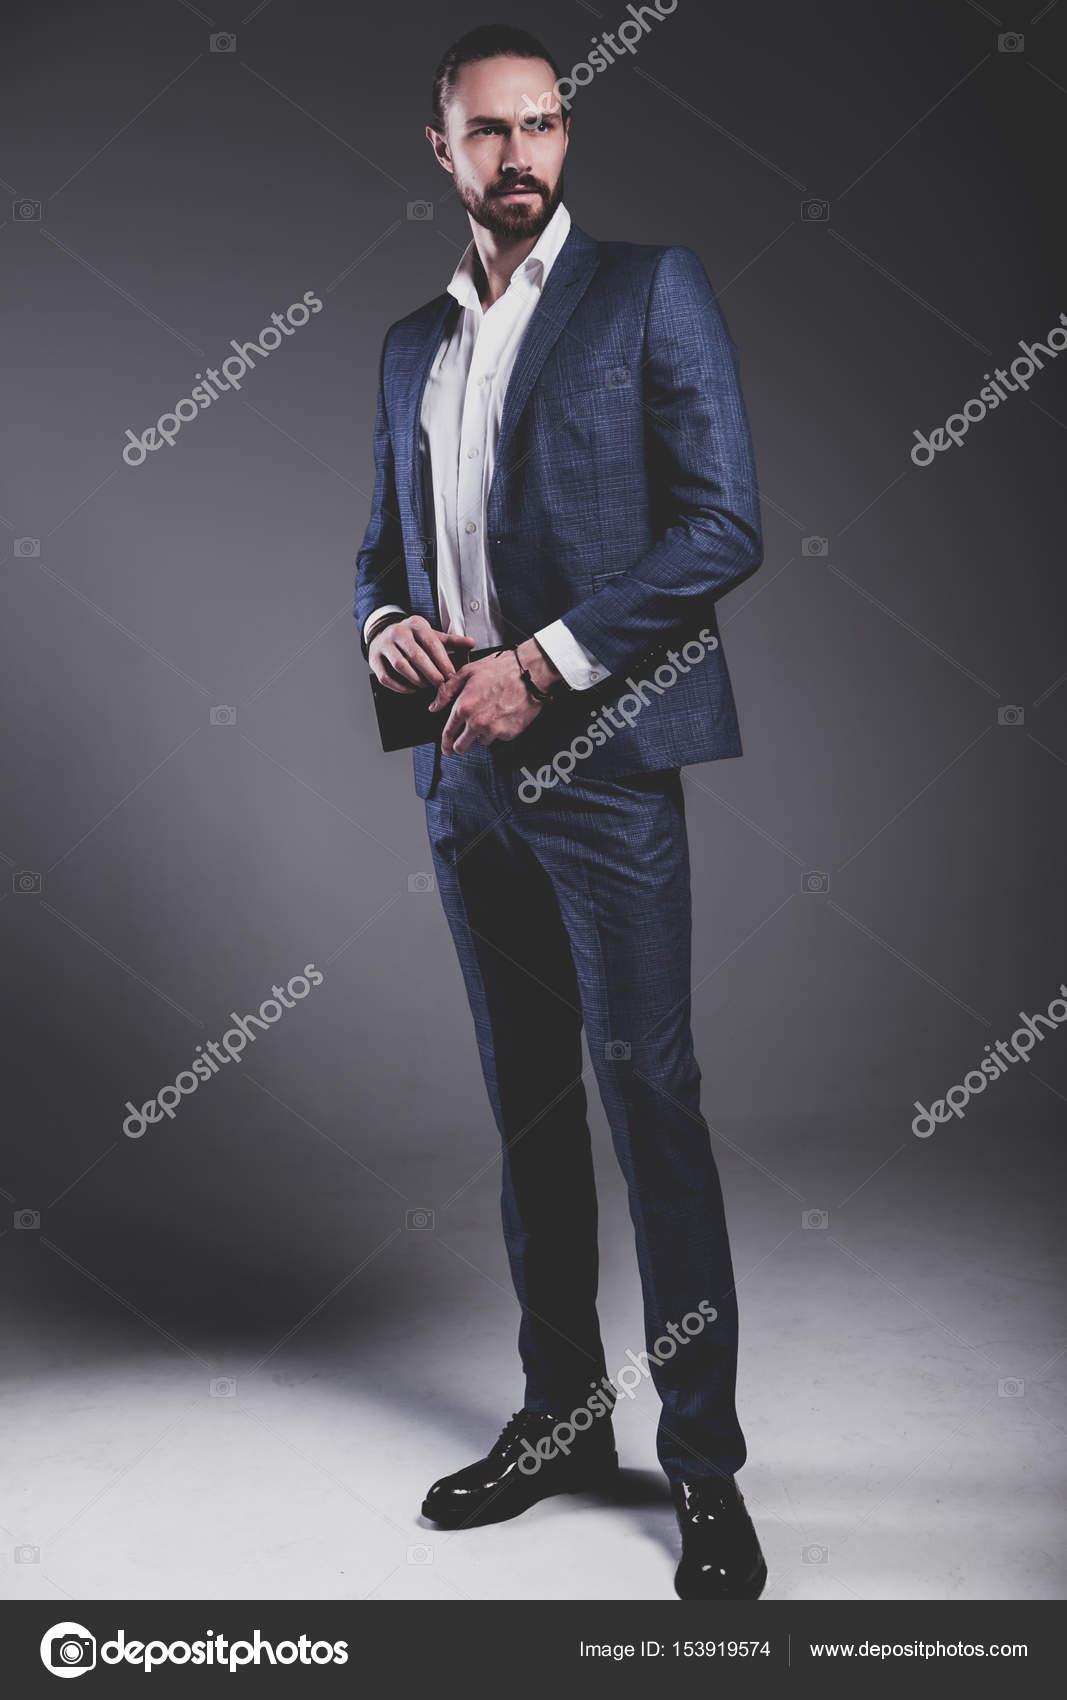 2273428a0 Retrato de guapos moda hipster estilo empresario modelo vestido con elegante  traje azul posando sobre fondo gris en estudio.